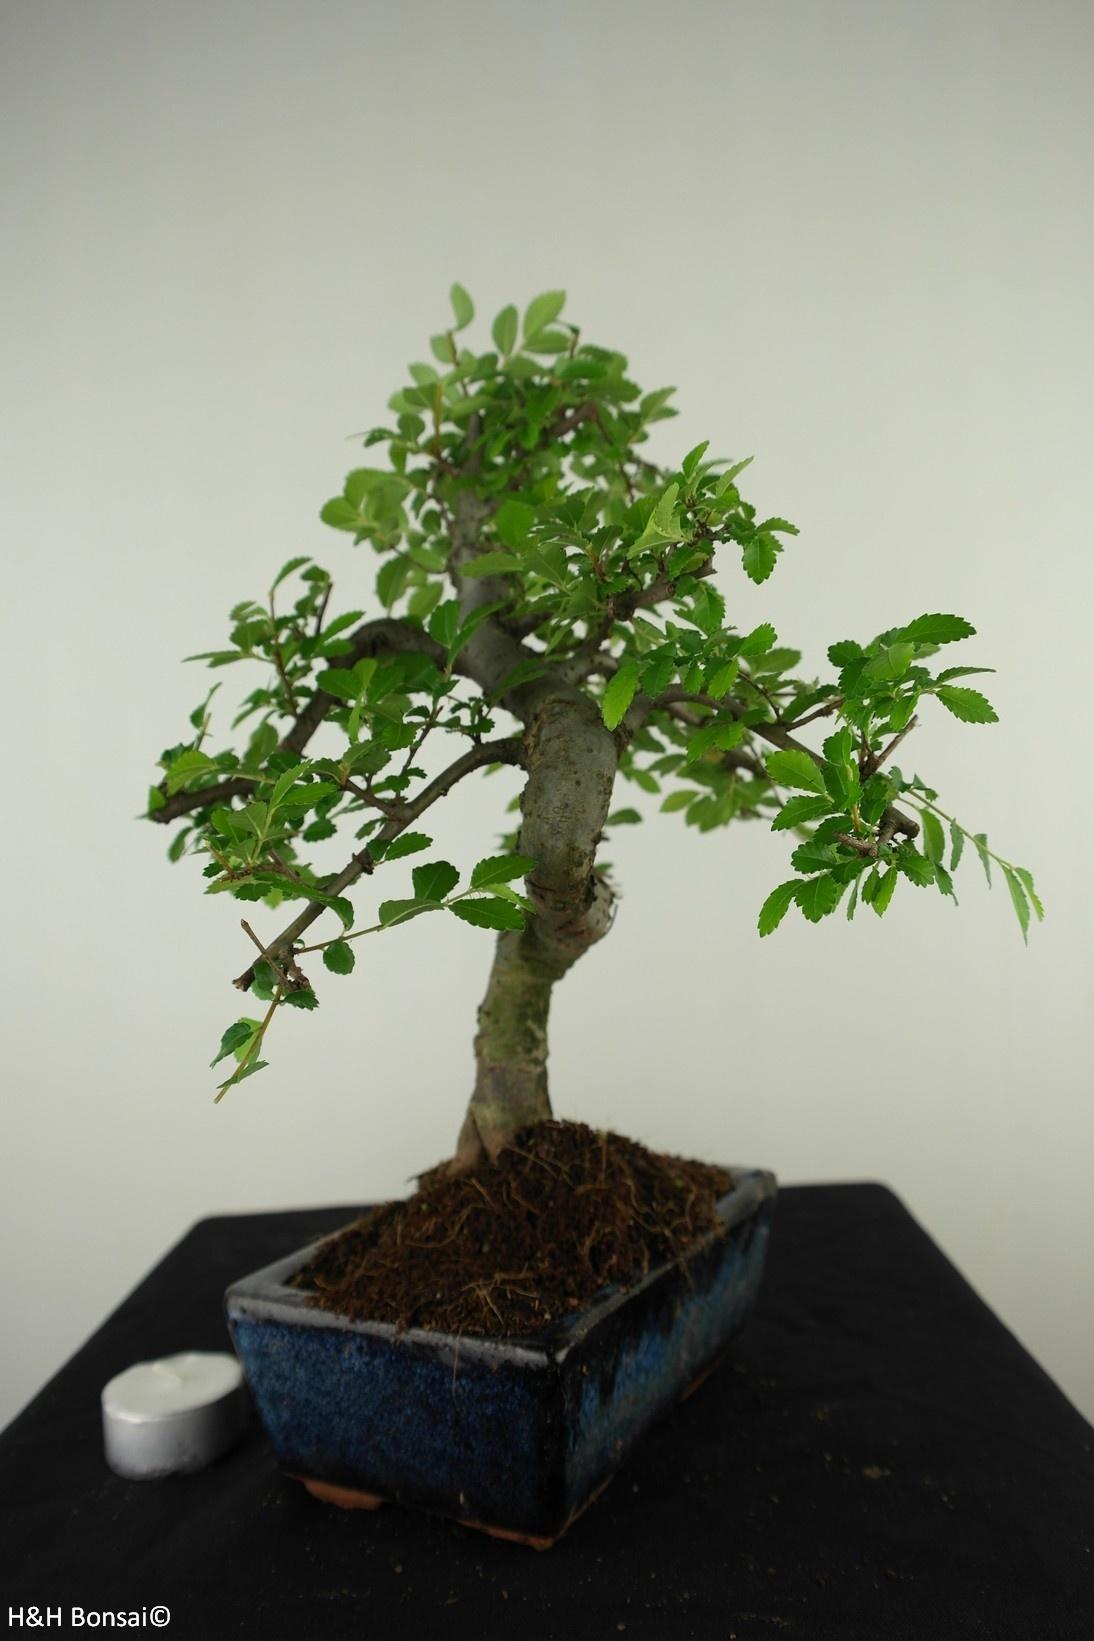 Bonsai Chinese Elm, Ulmus, no. 7736